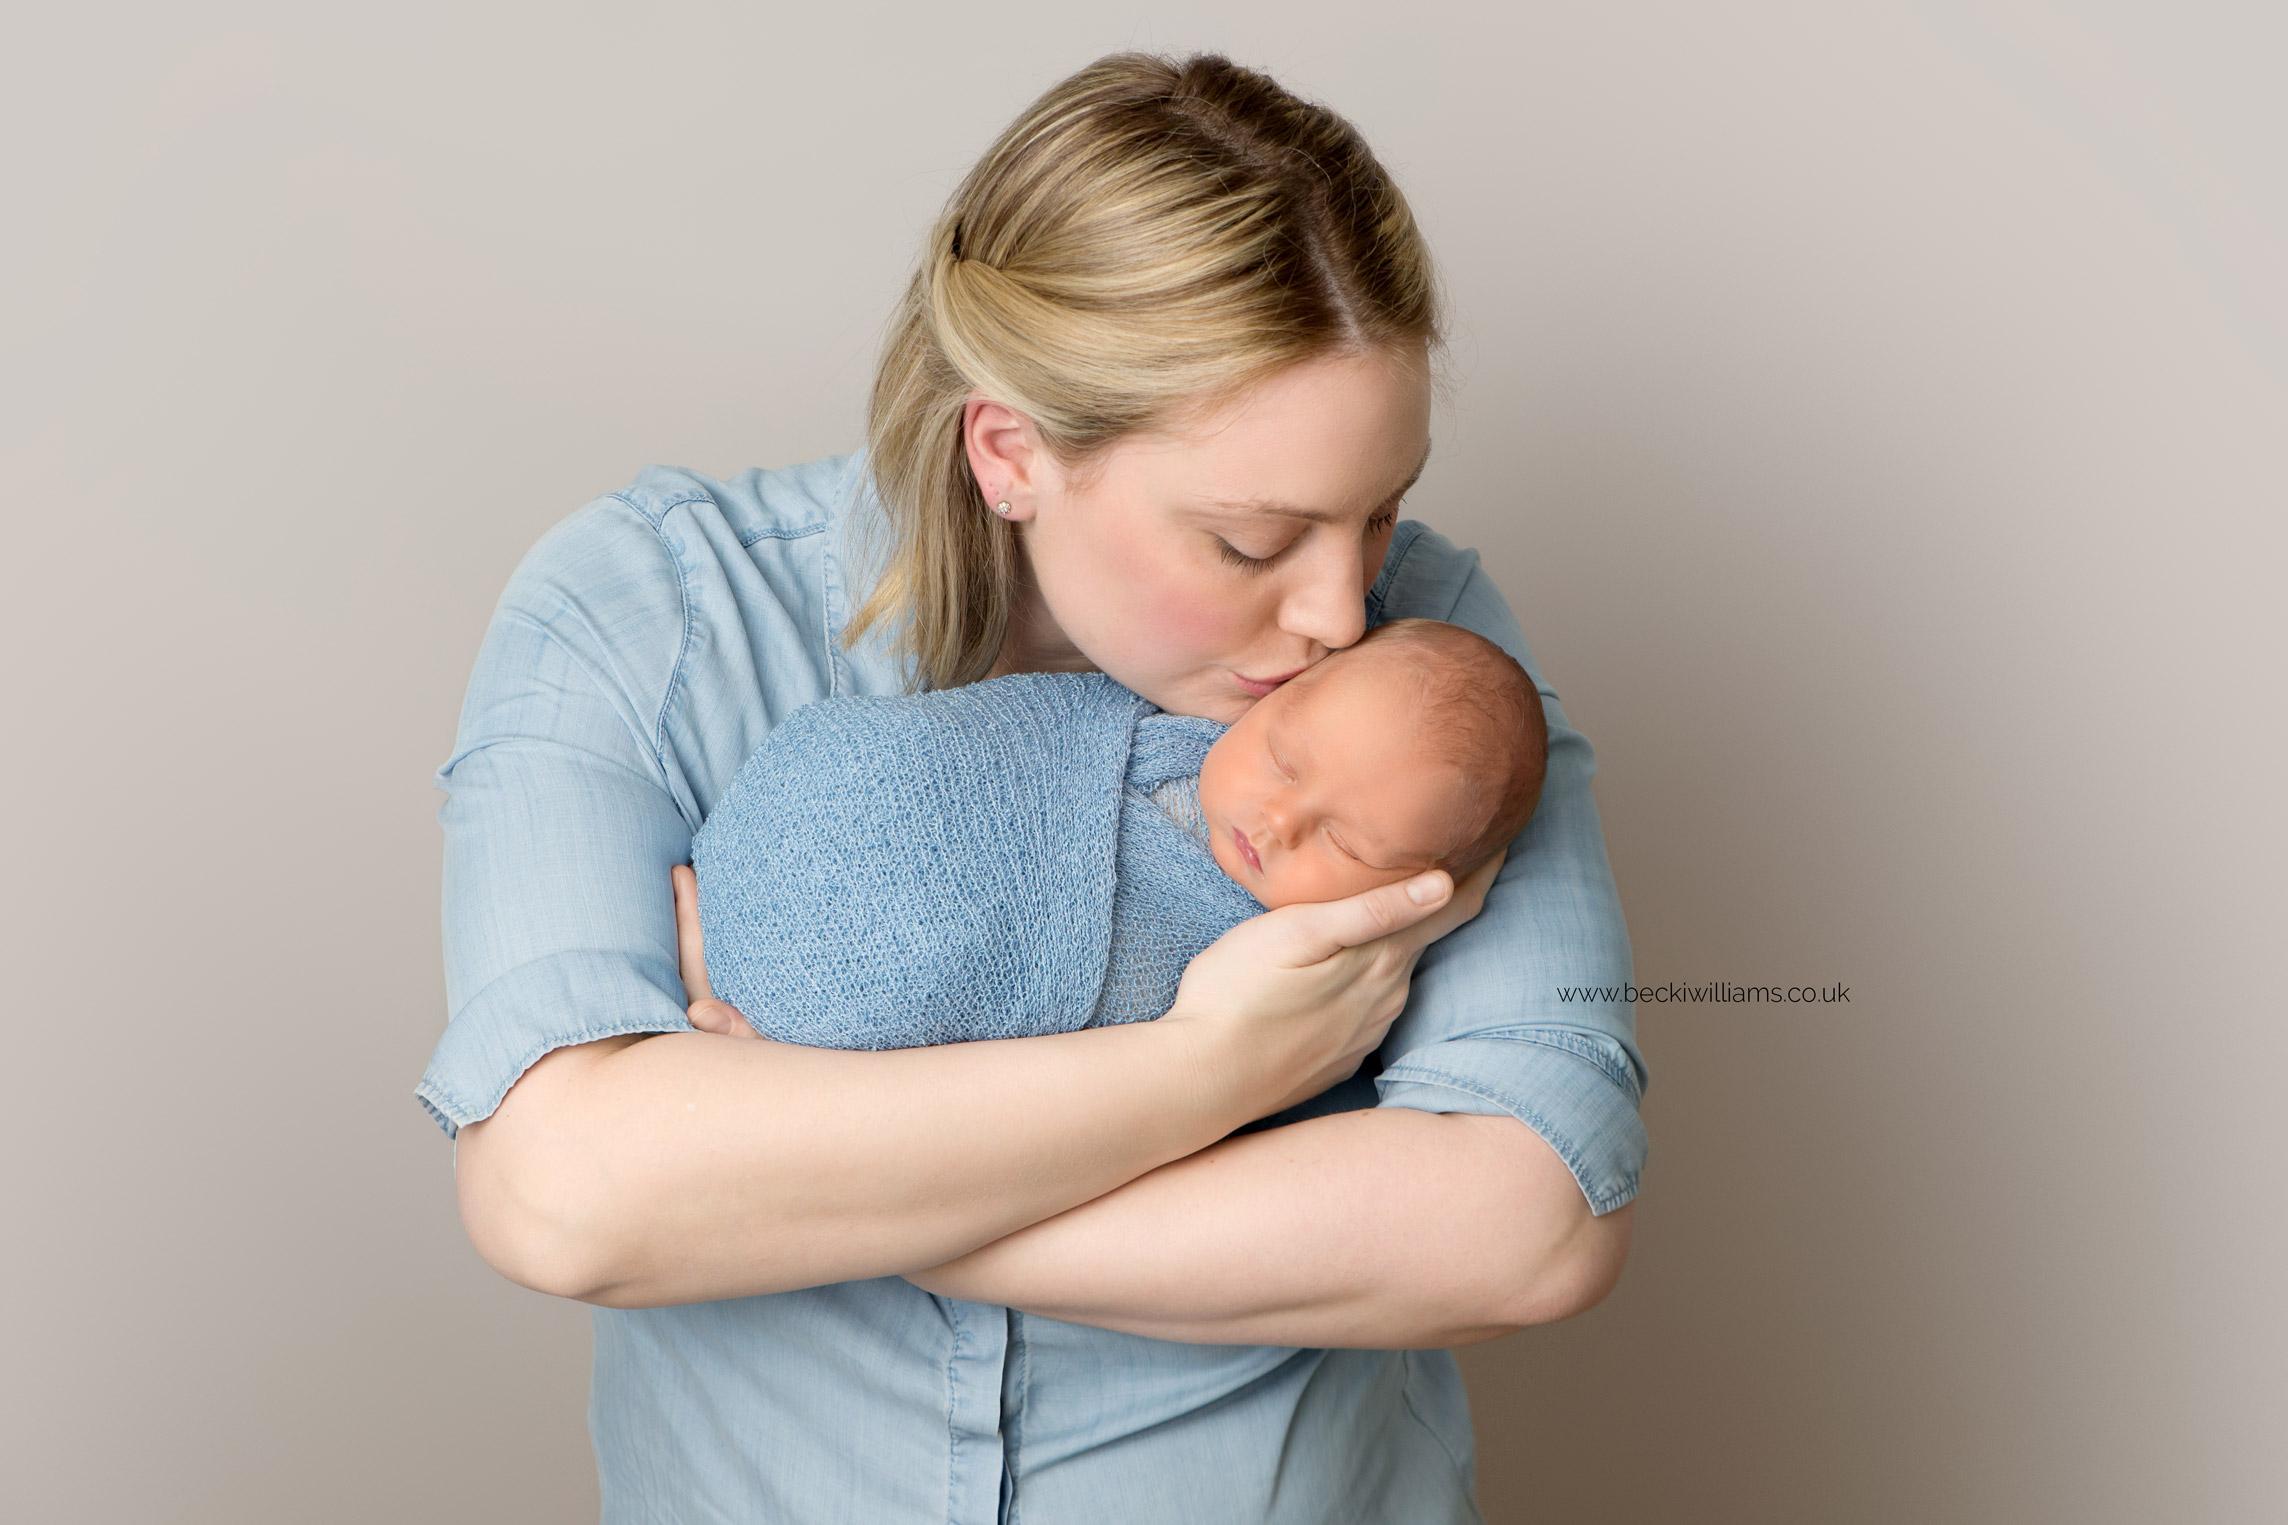 newborn-boy-portraits-hemel-hempstead-family-new-mum.jpg